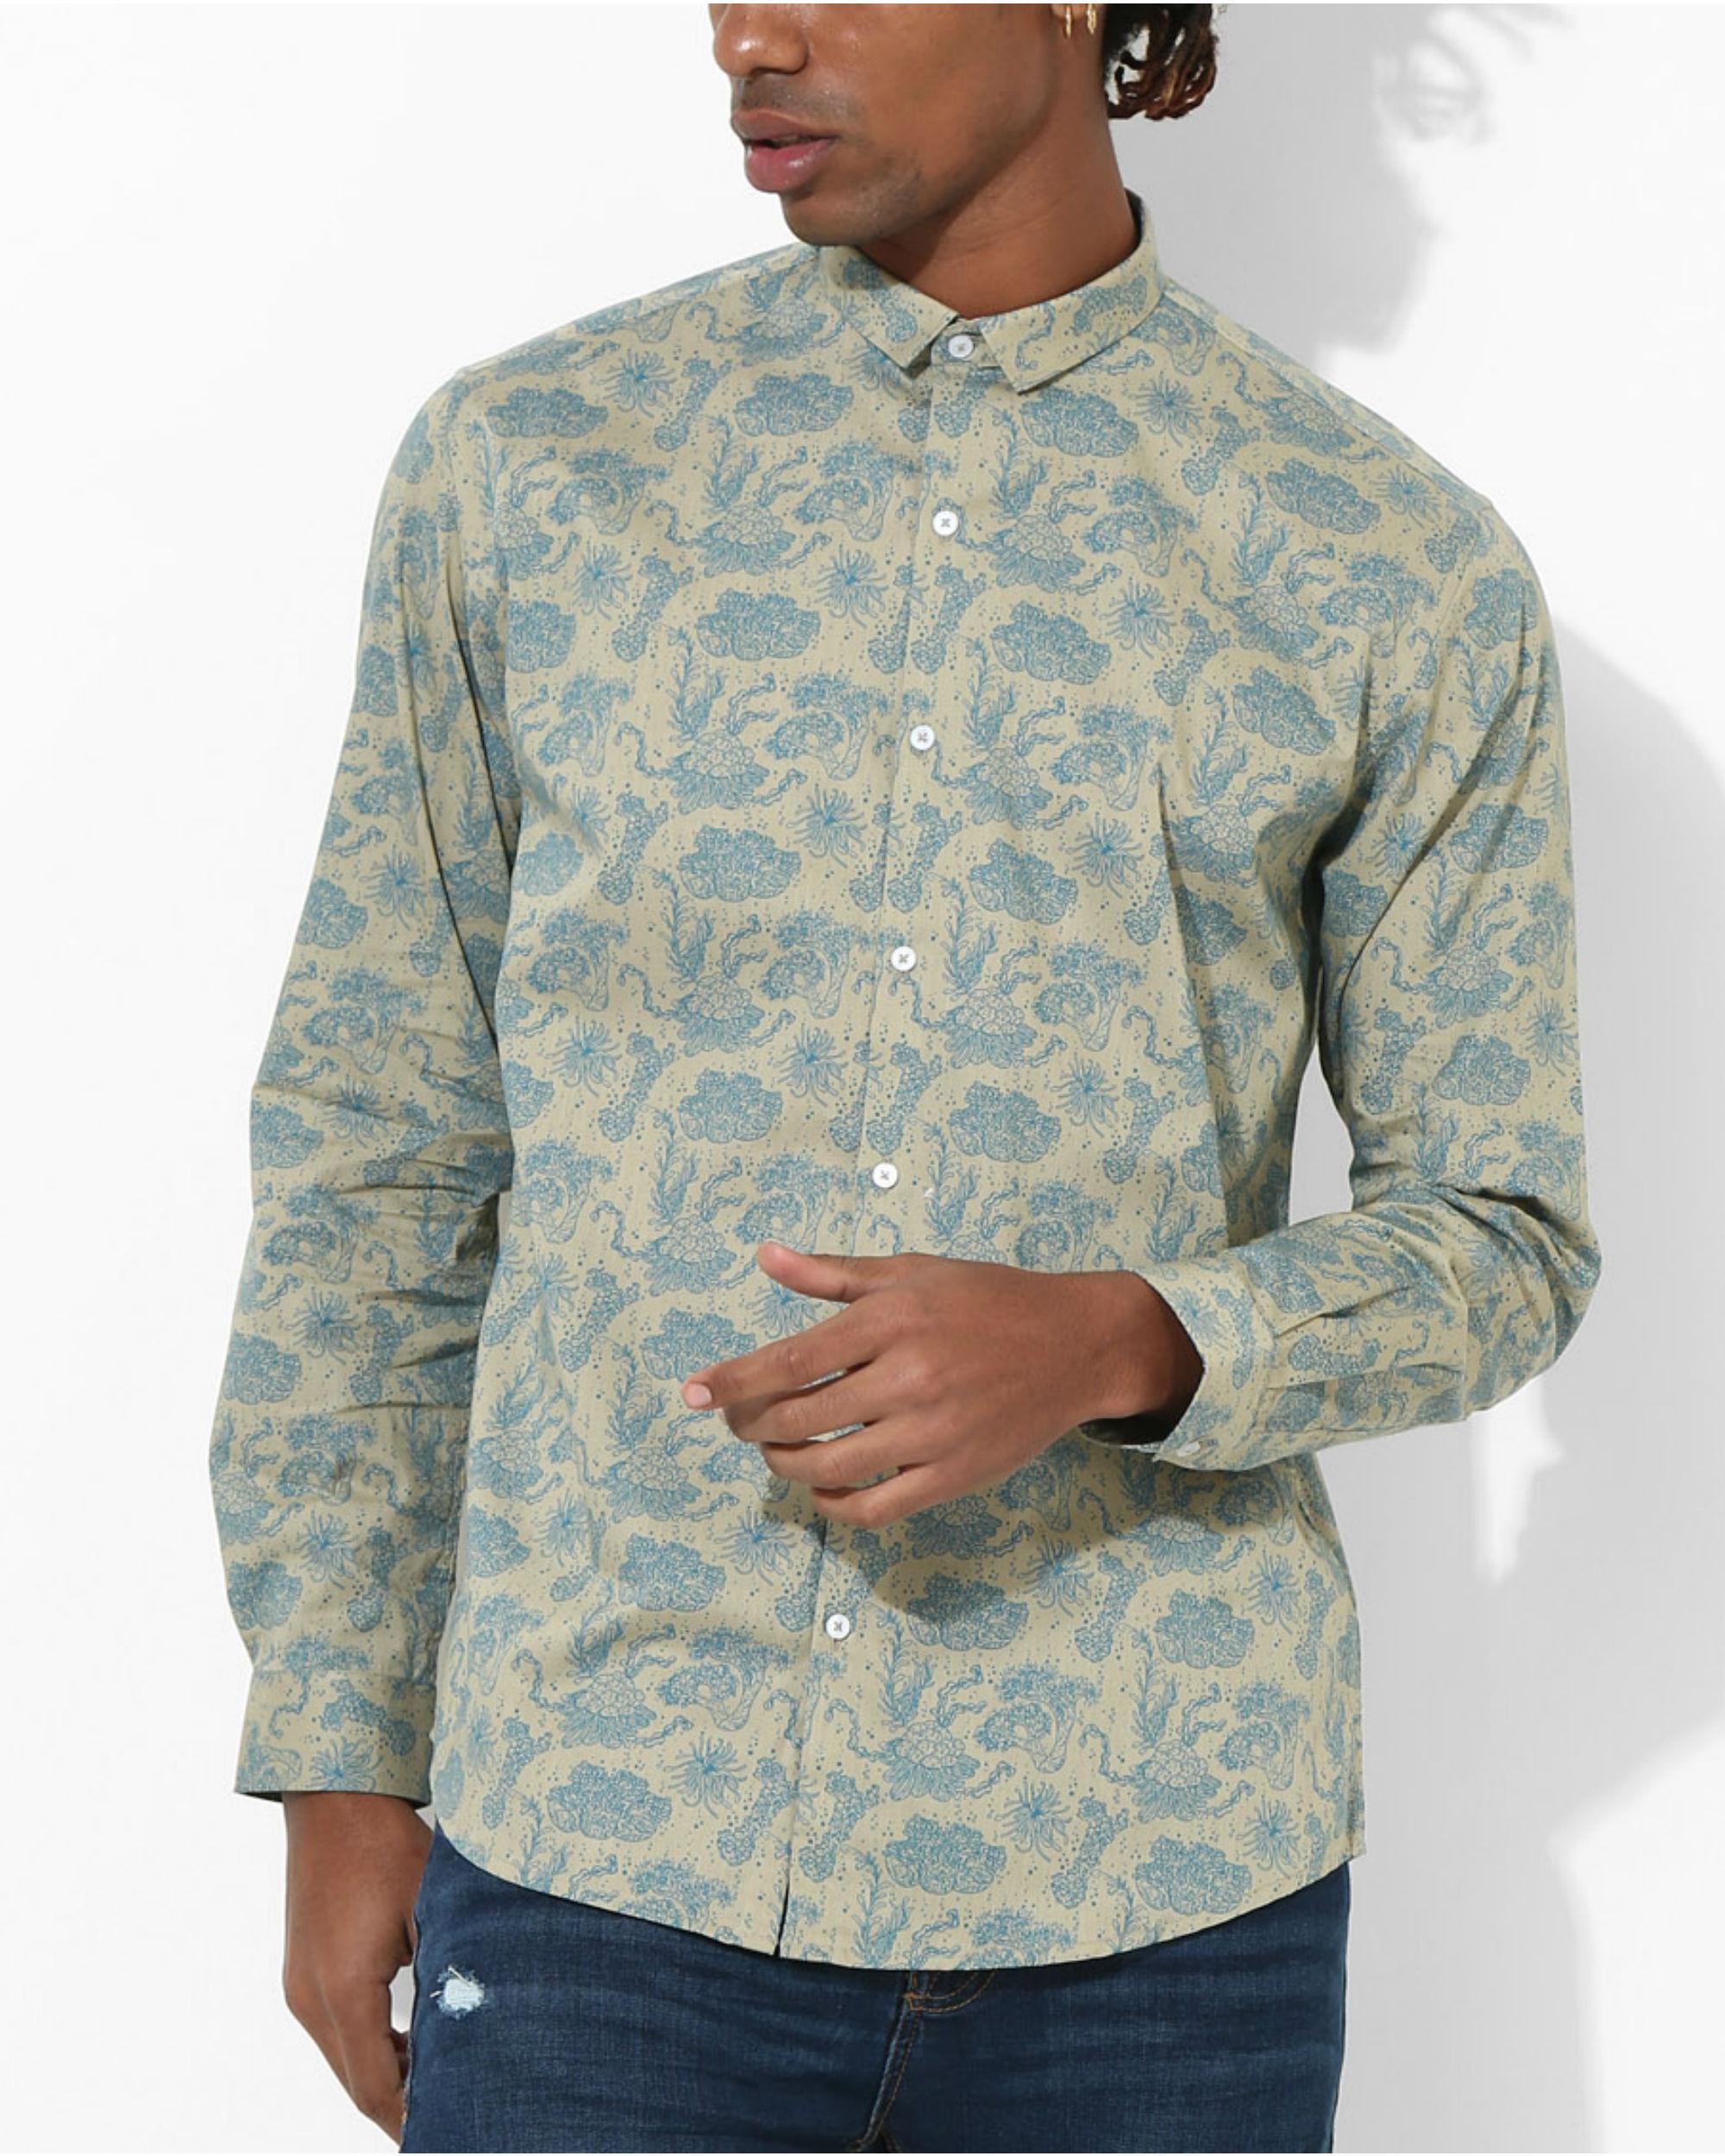 Printed Floral Beige Shirt